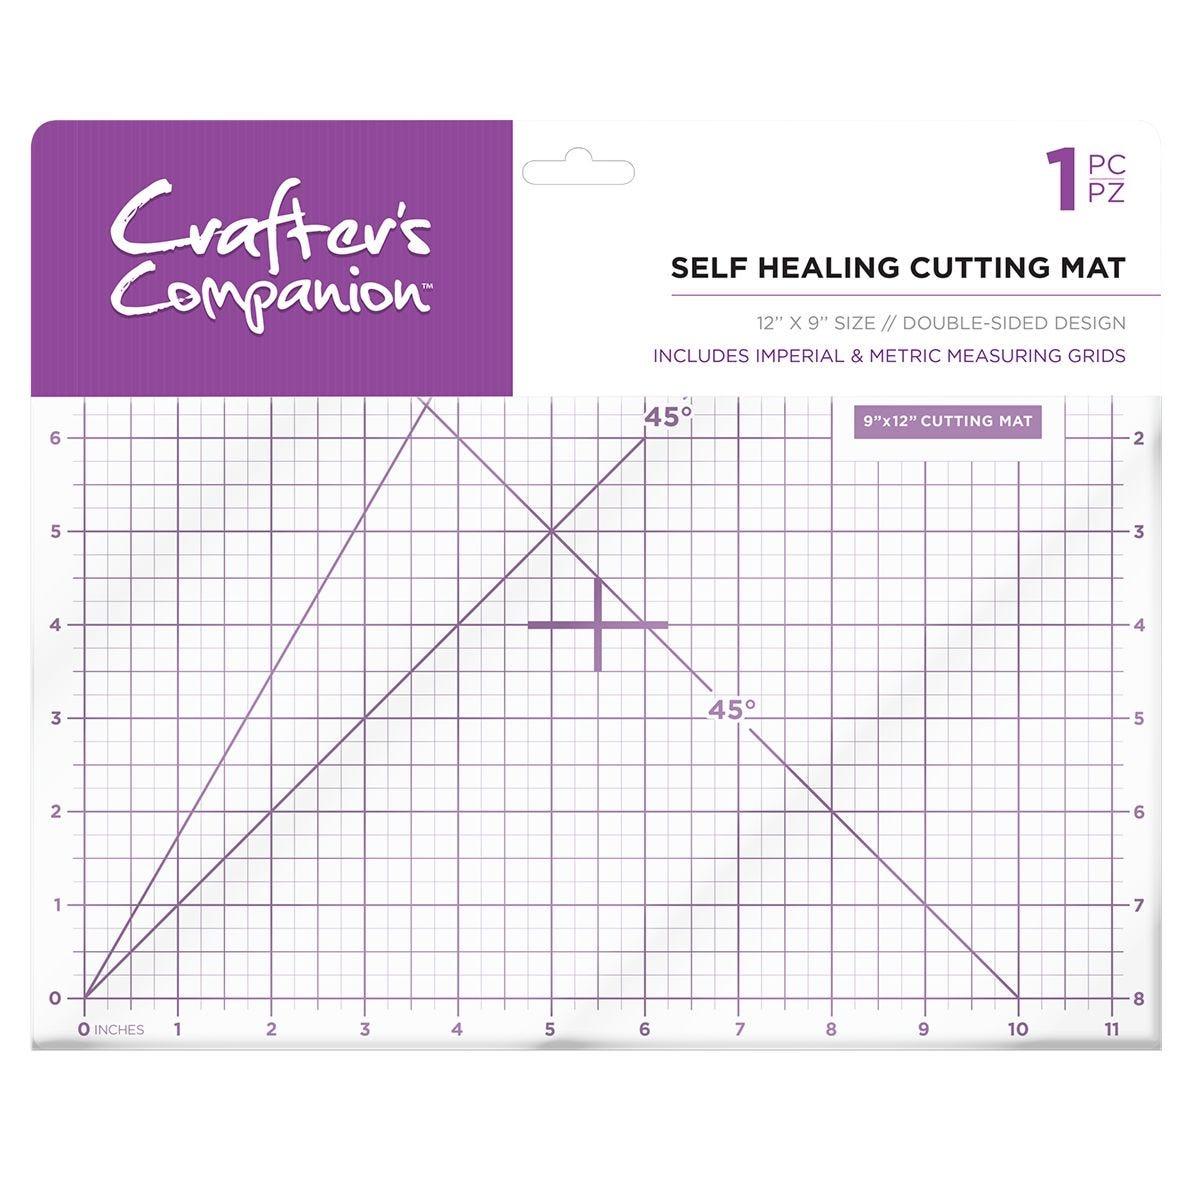 Crafter's Companion Cutting Mat - 12